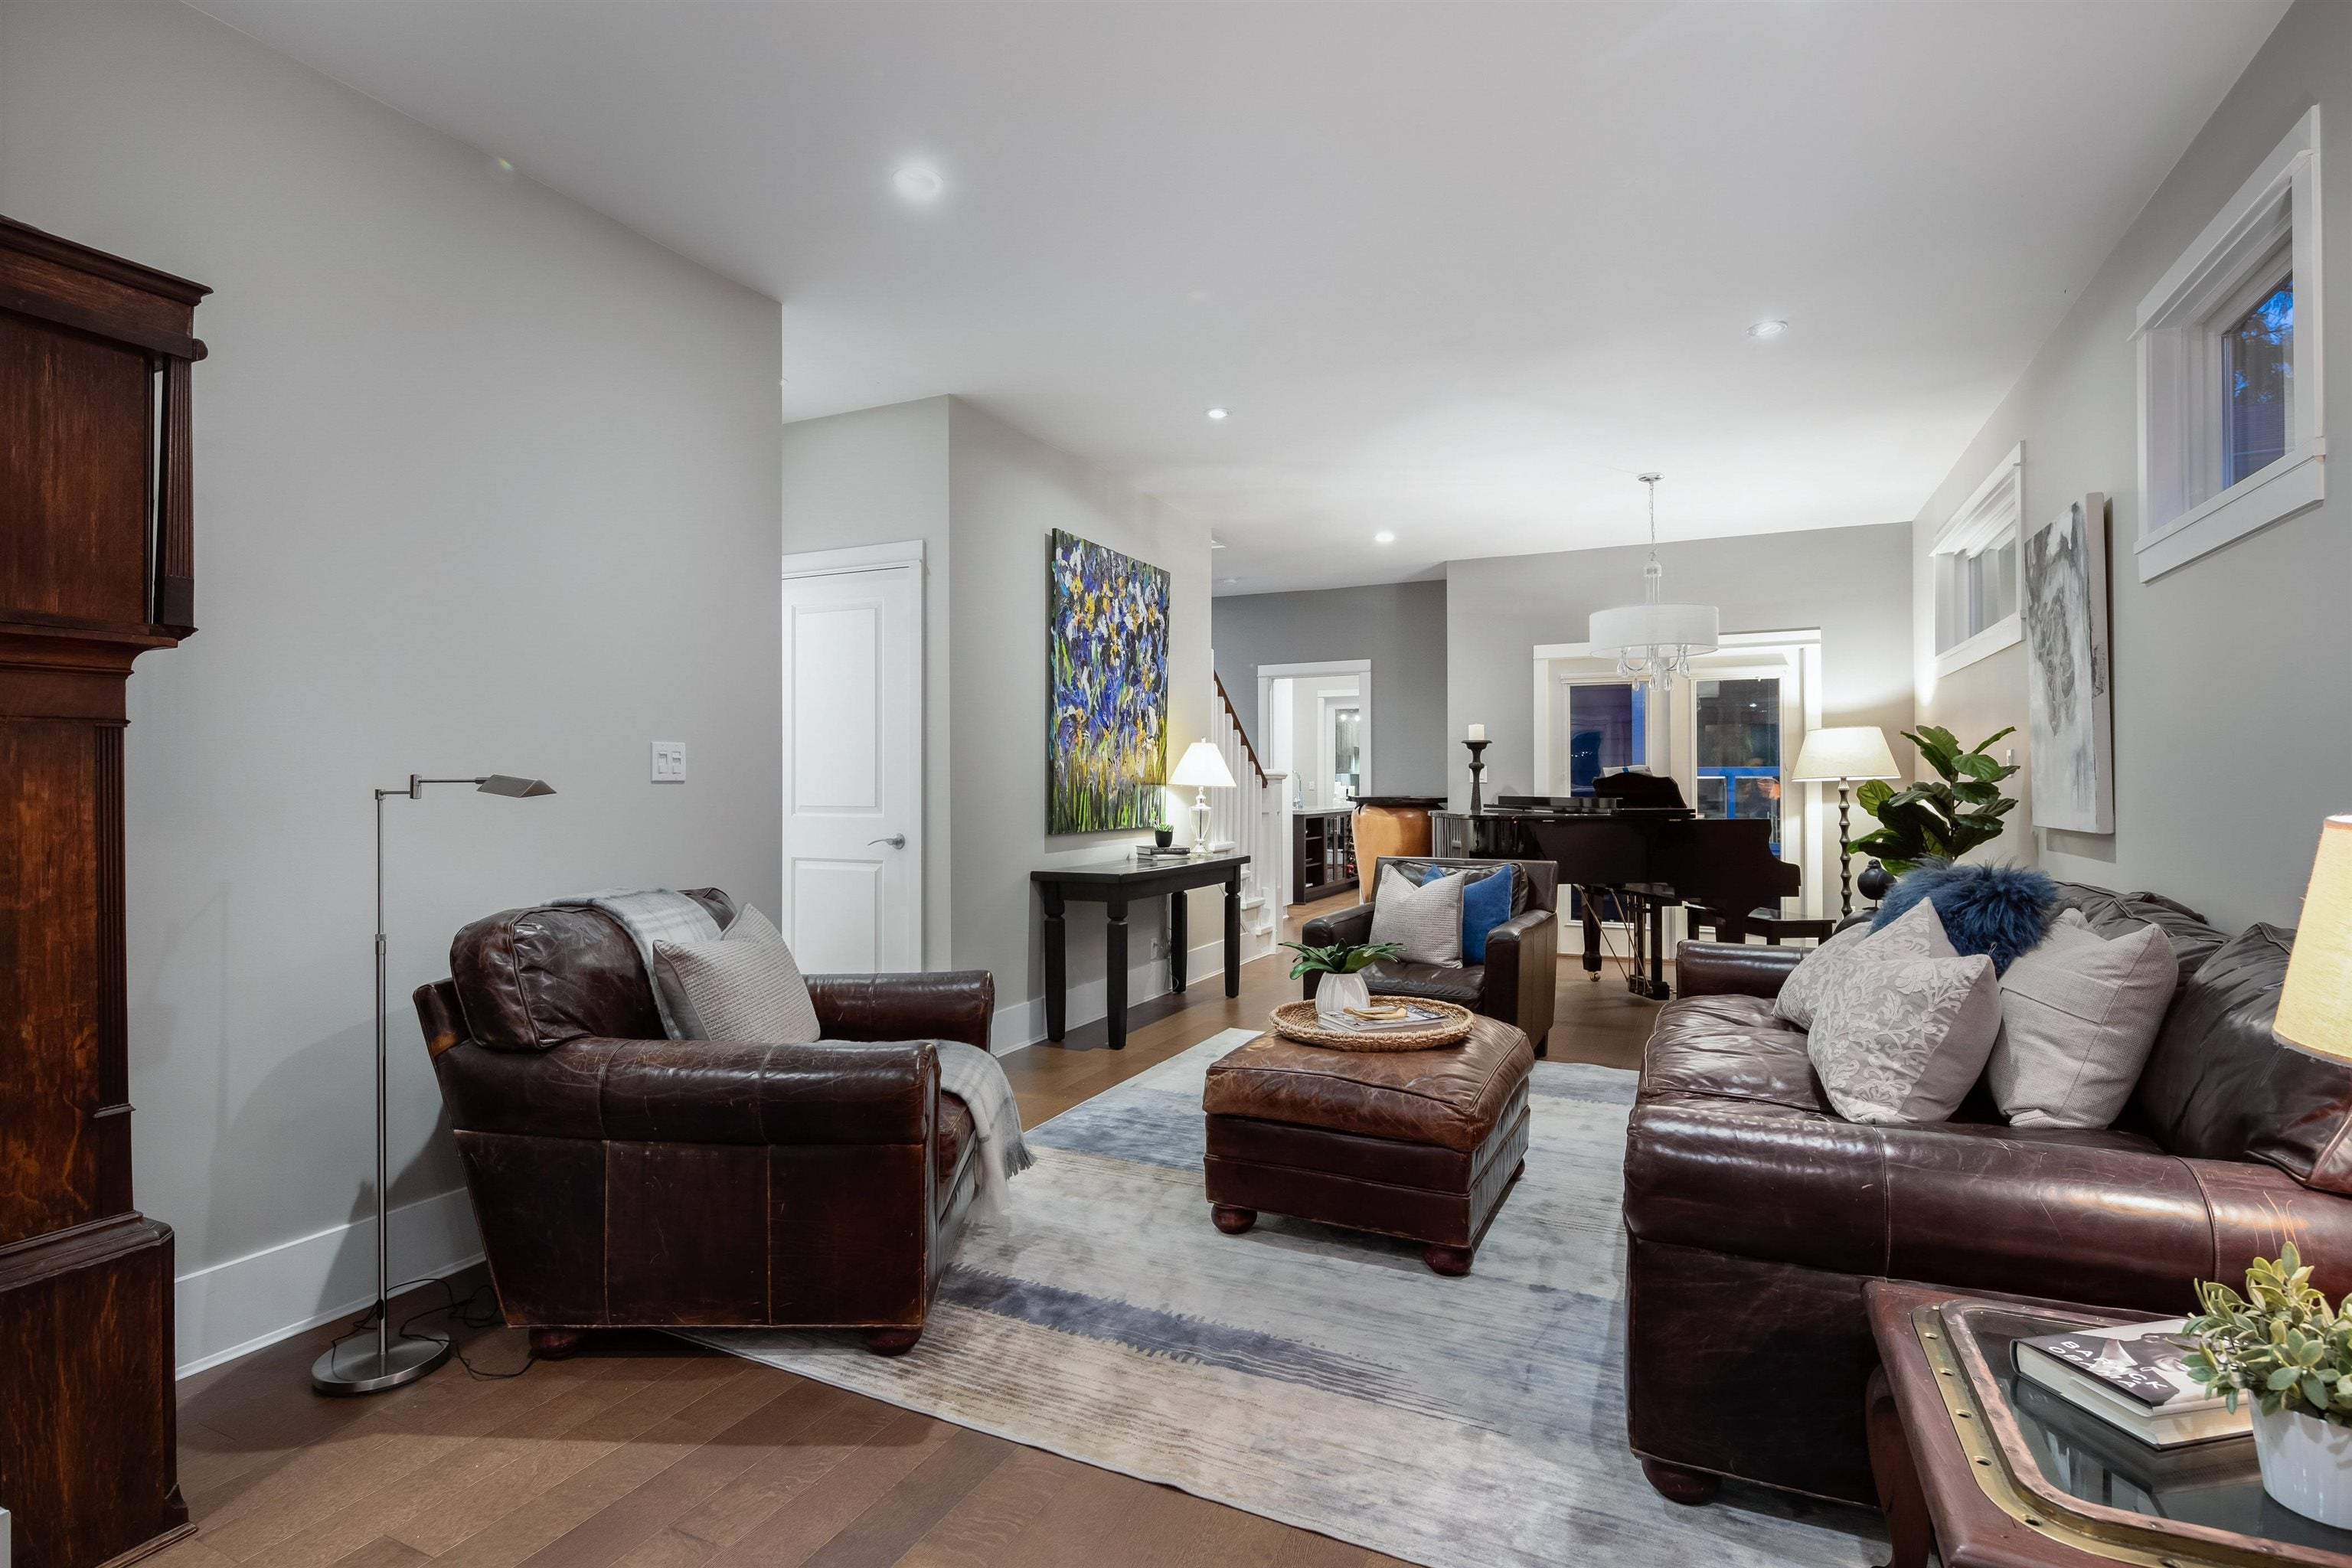 2258 WINDRIDGE DRIVE - Seymour NV House/Single Family for sale, 5 Bedrooms (R2617156) - #18